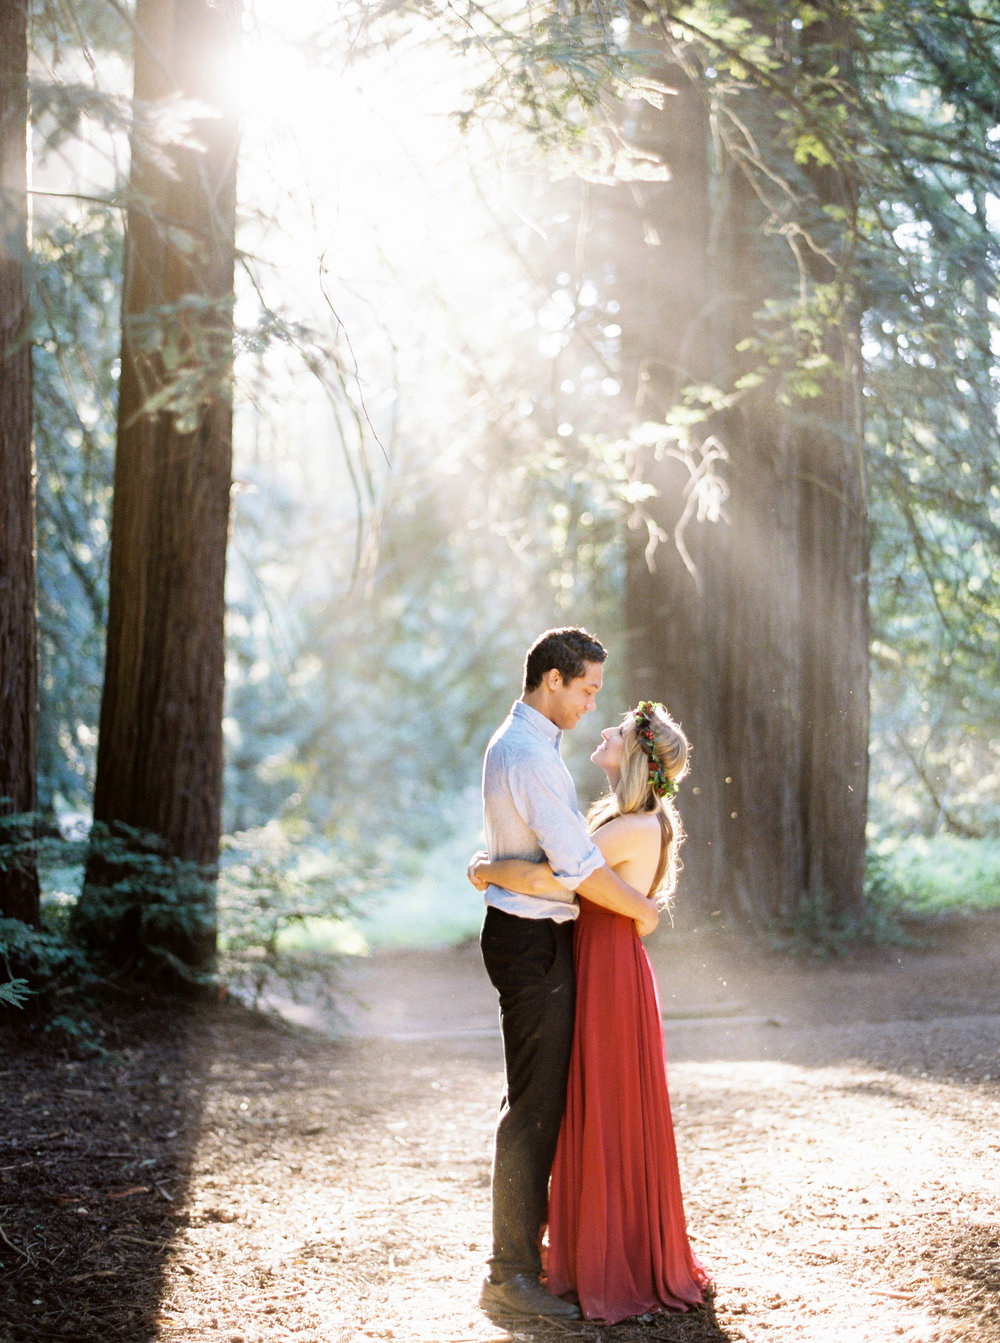 redwood-forest-engagement-in-oakland-california-18.jpg